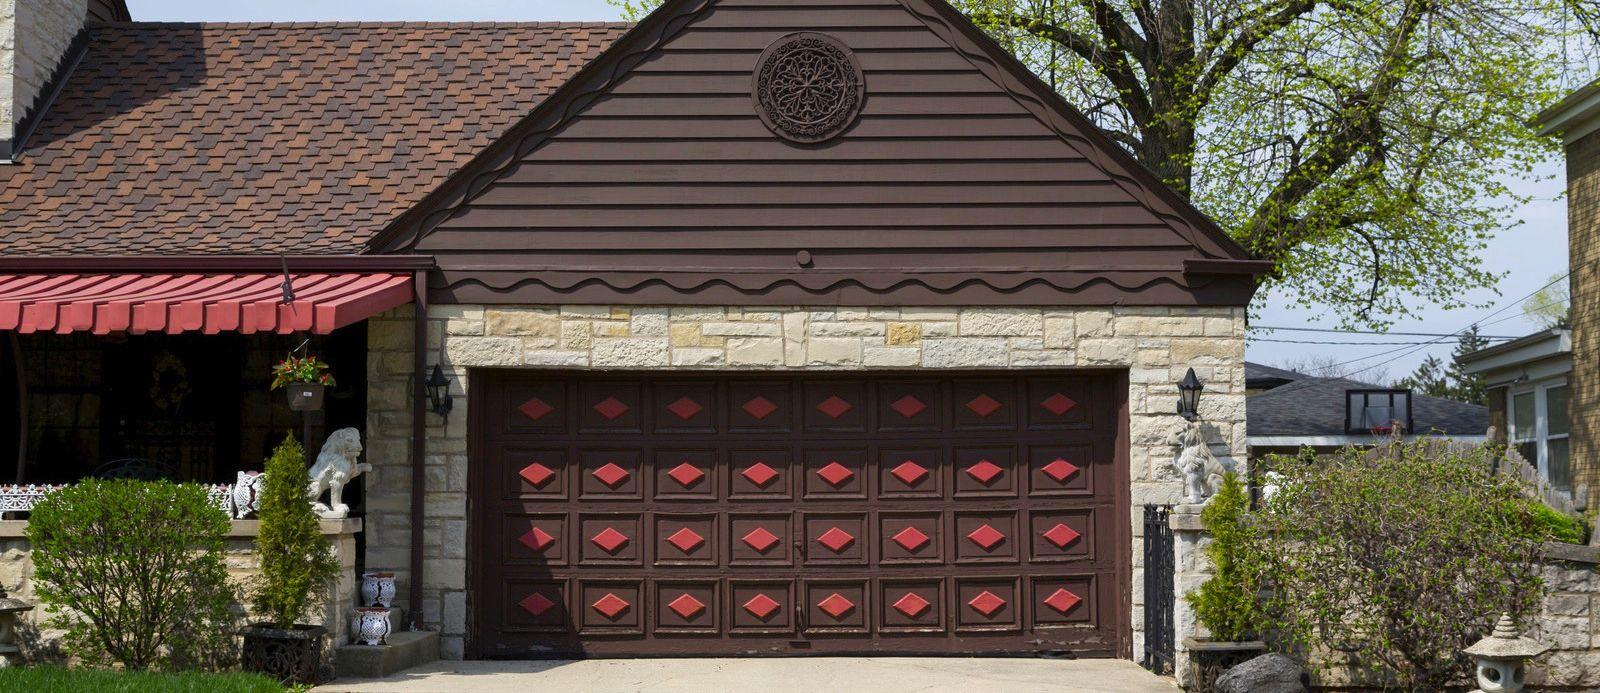 Garage Door Repair Amp Installation In Sherman Oaks Ca 24